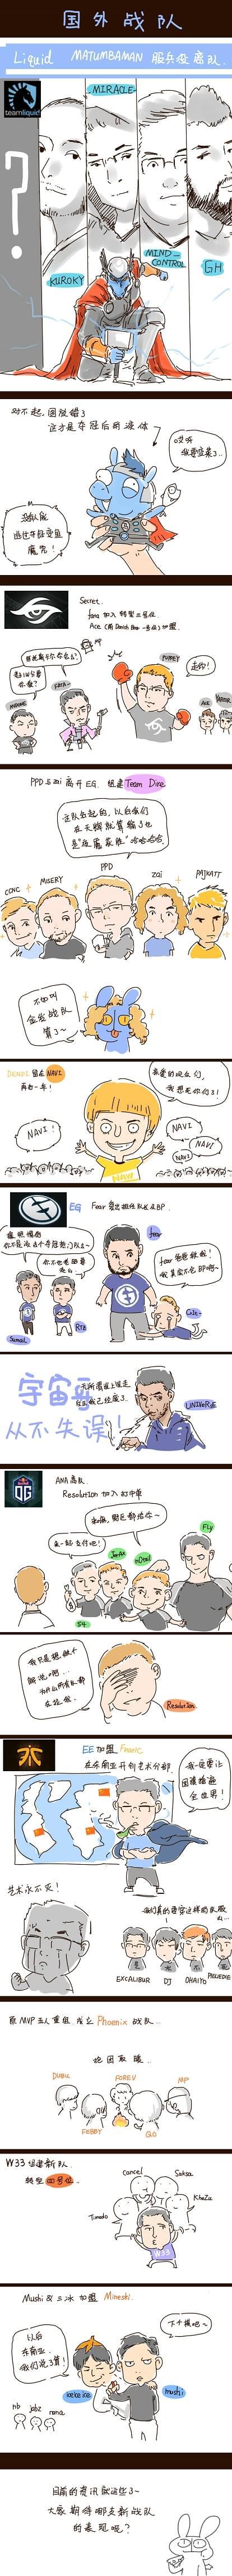 GL大神漫画总结转会期 没有窝B不想看比赛了